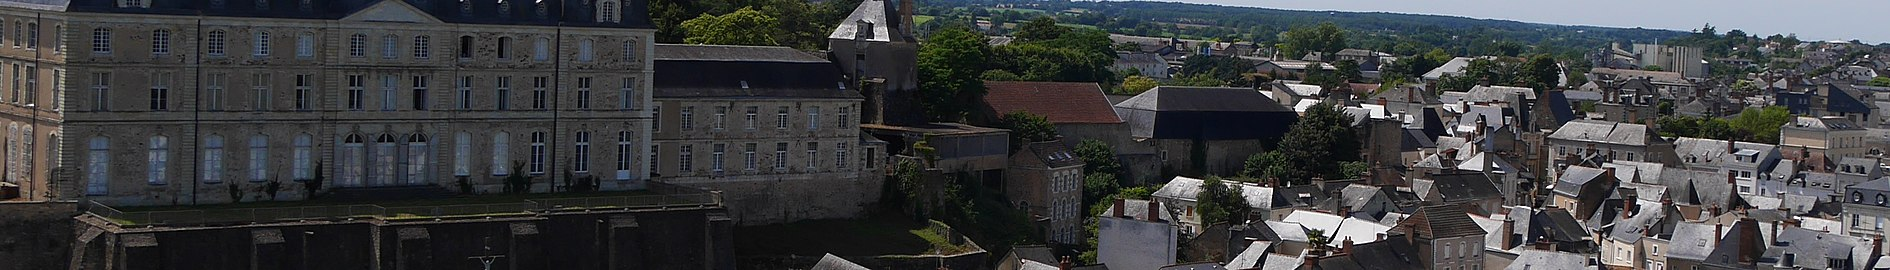 Sablé-sur-Sarthe (cropped).jpg